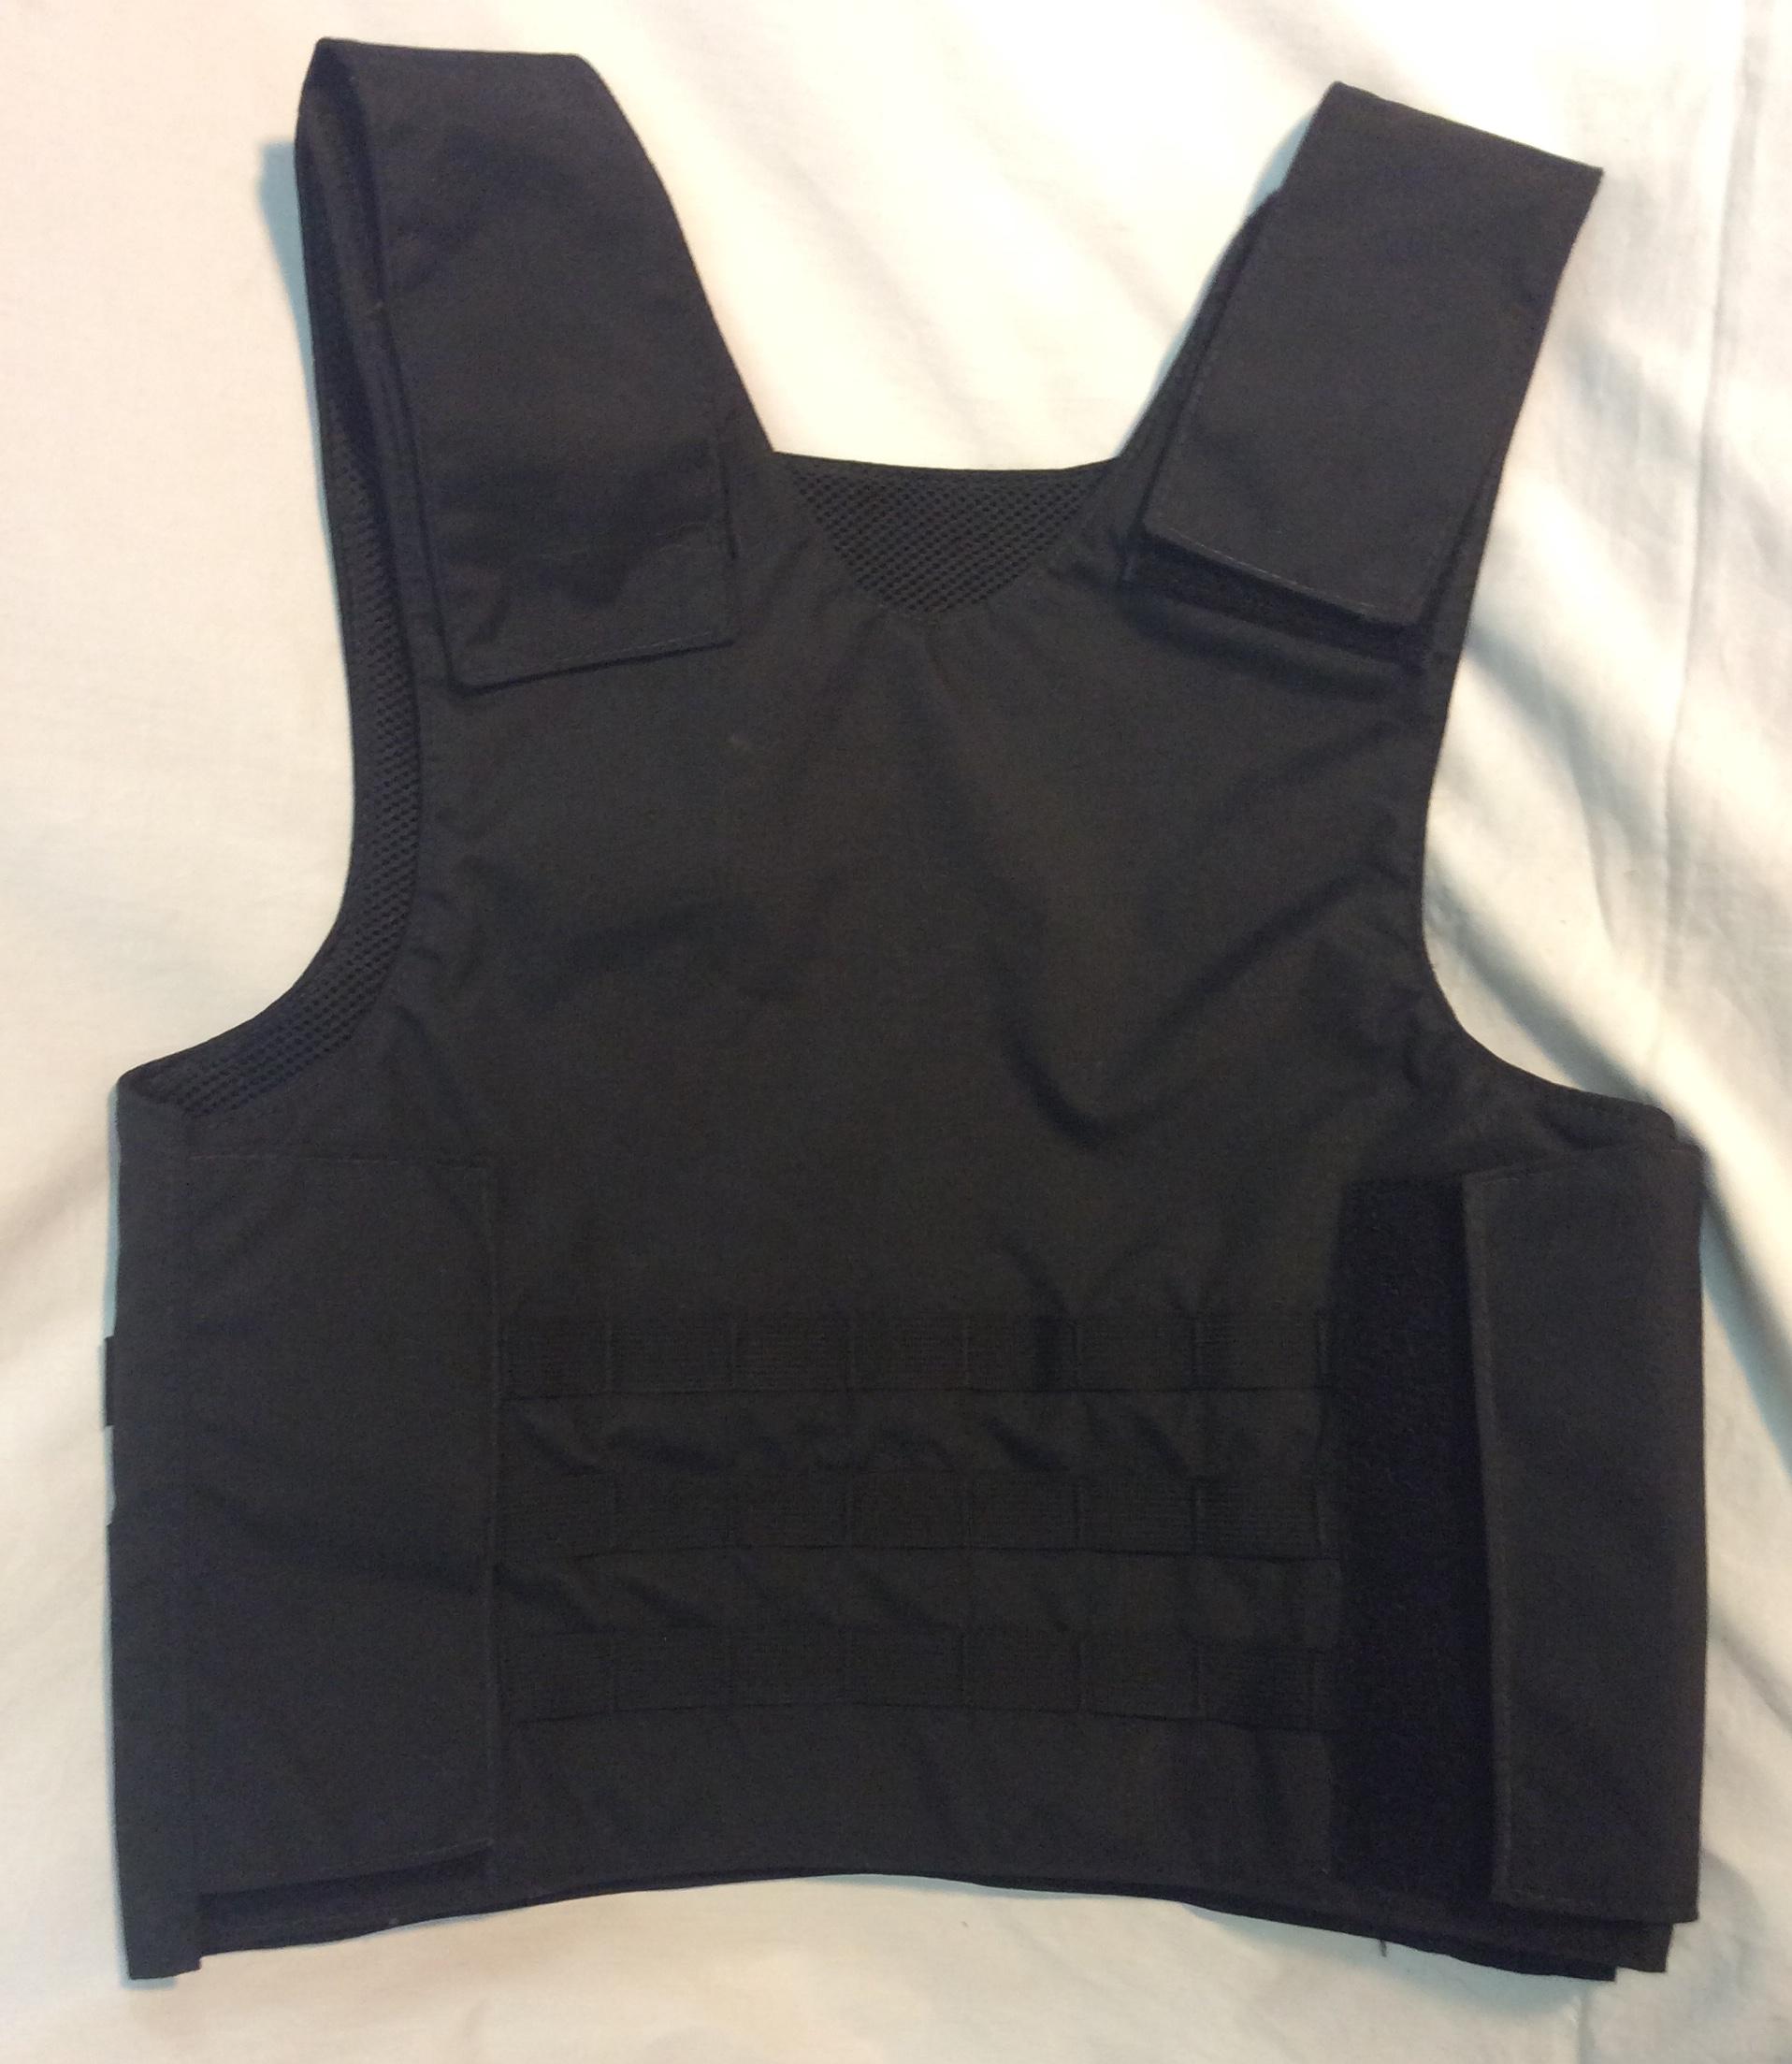 Black Flak vest with wide velcro